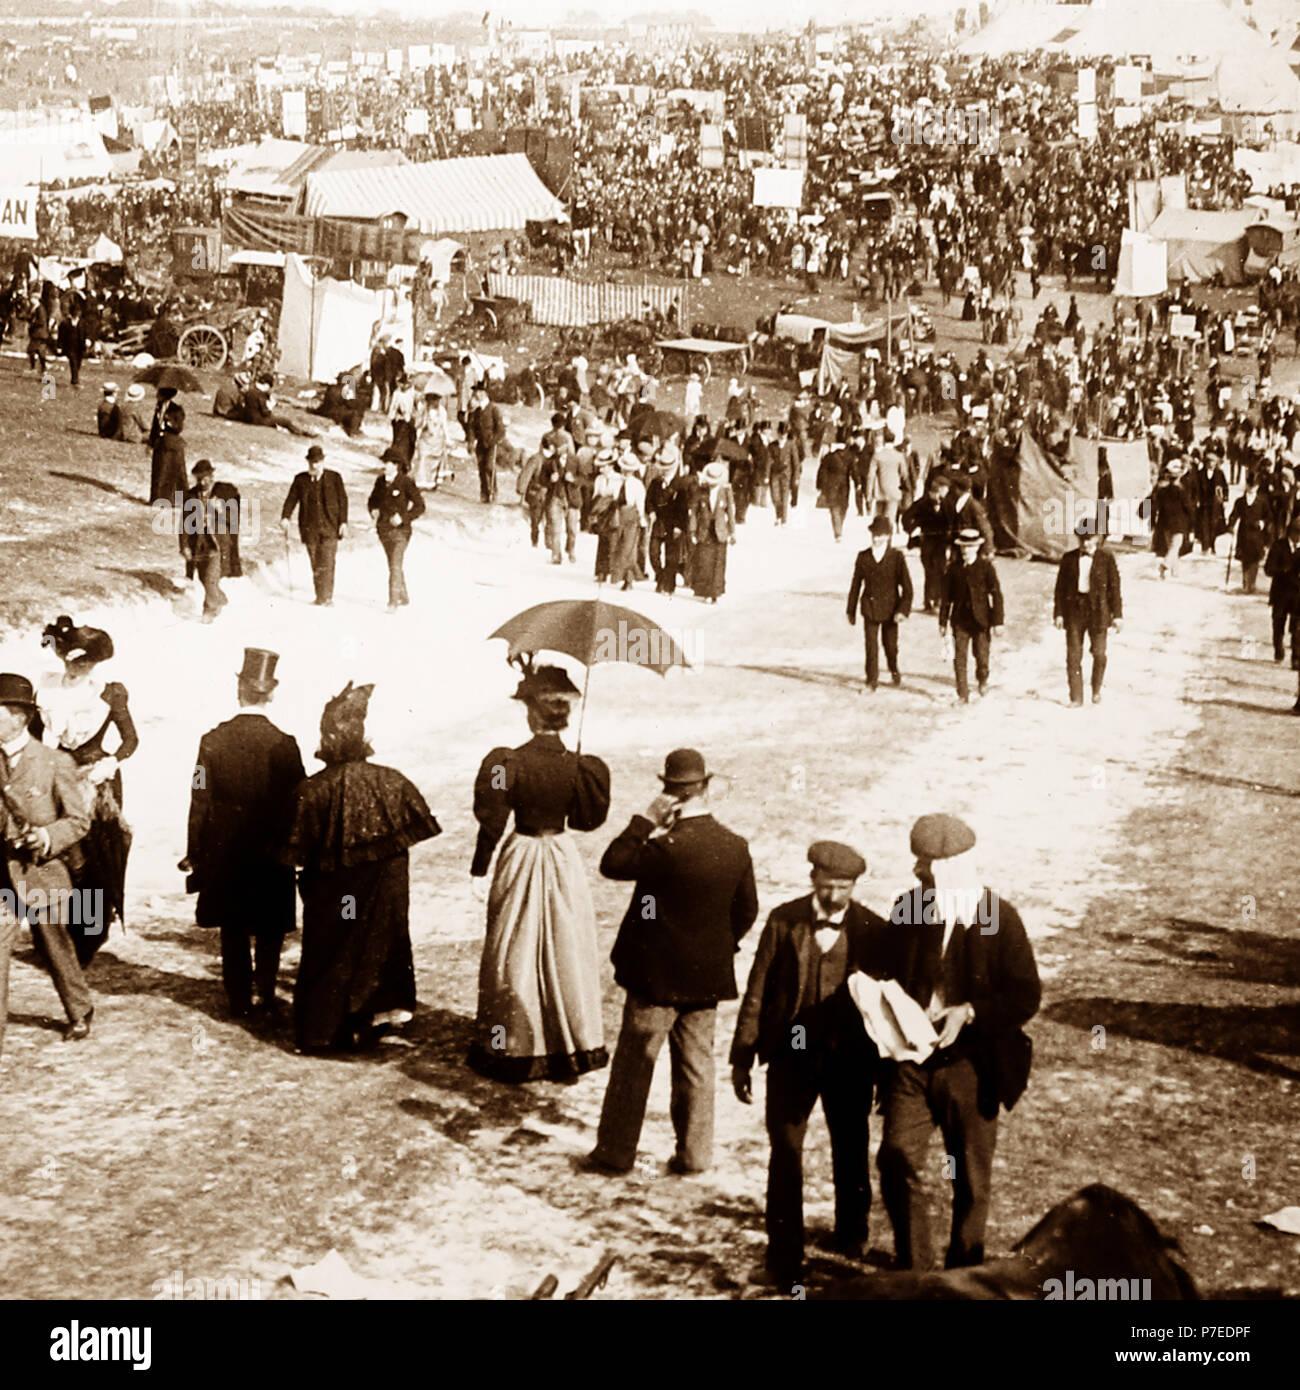 La Colina, pista de carreras Epsom Downs, 1900 Imagen De Stock